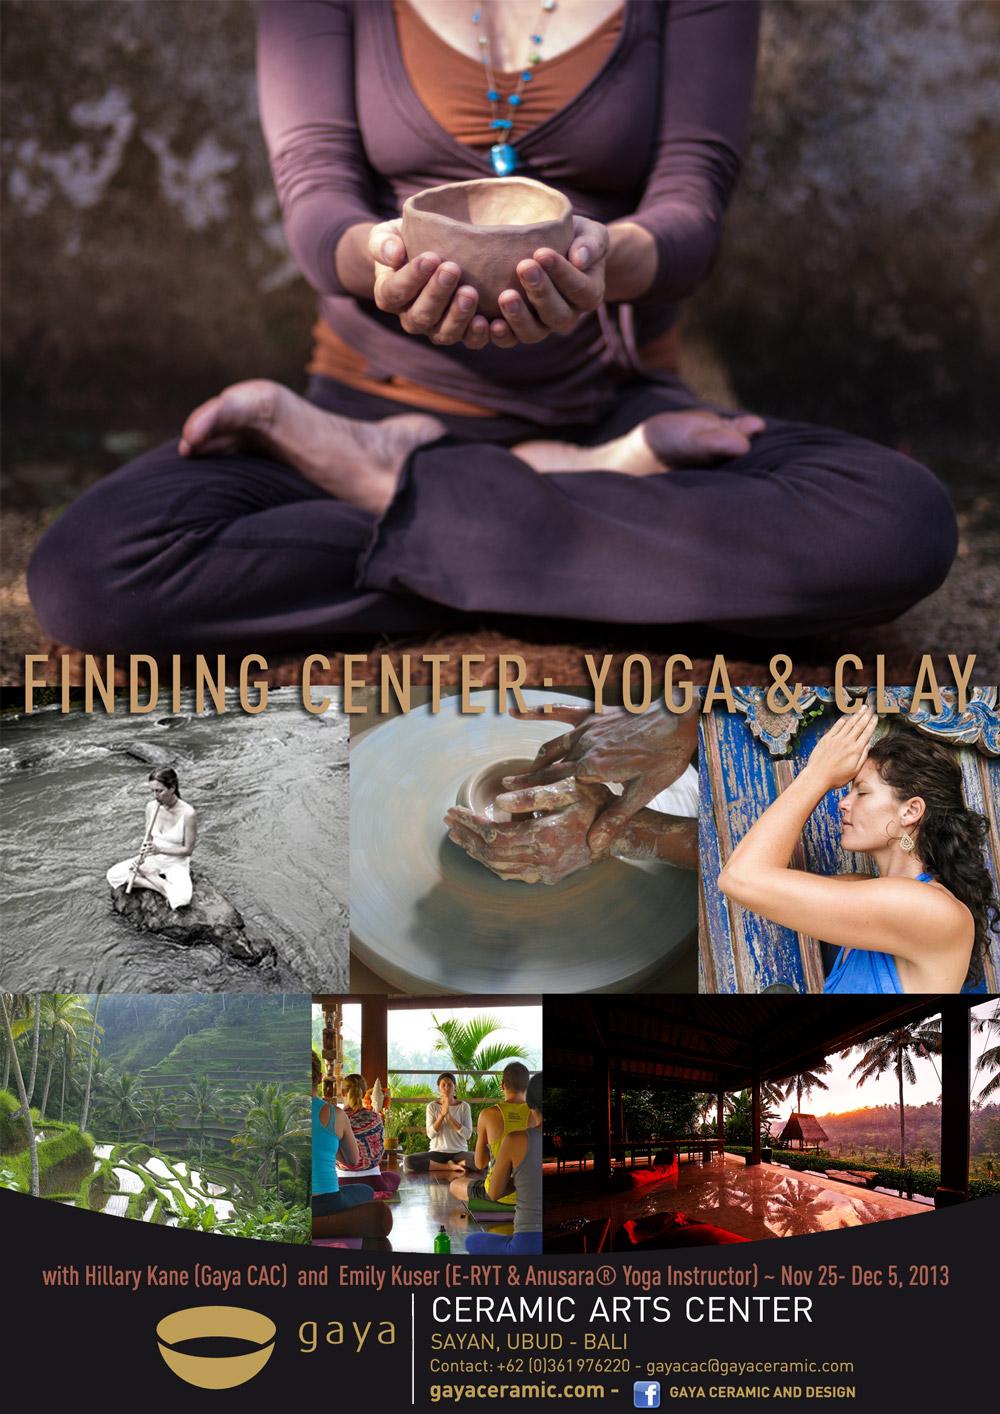 2013-11-HillaryKane-Yoga-and-Clay.jpg